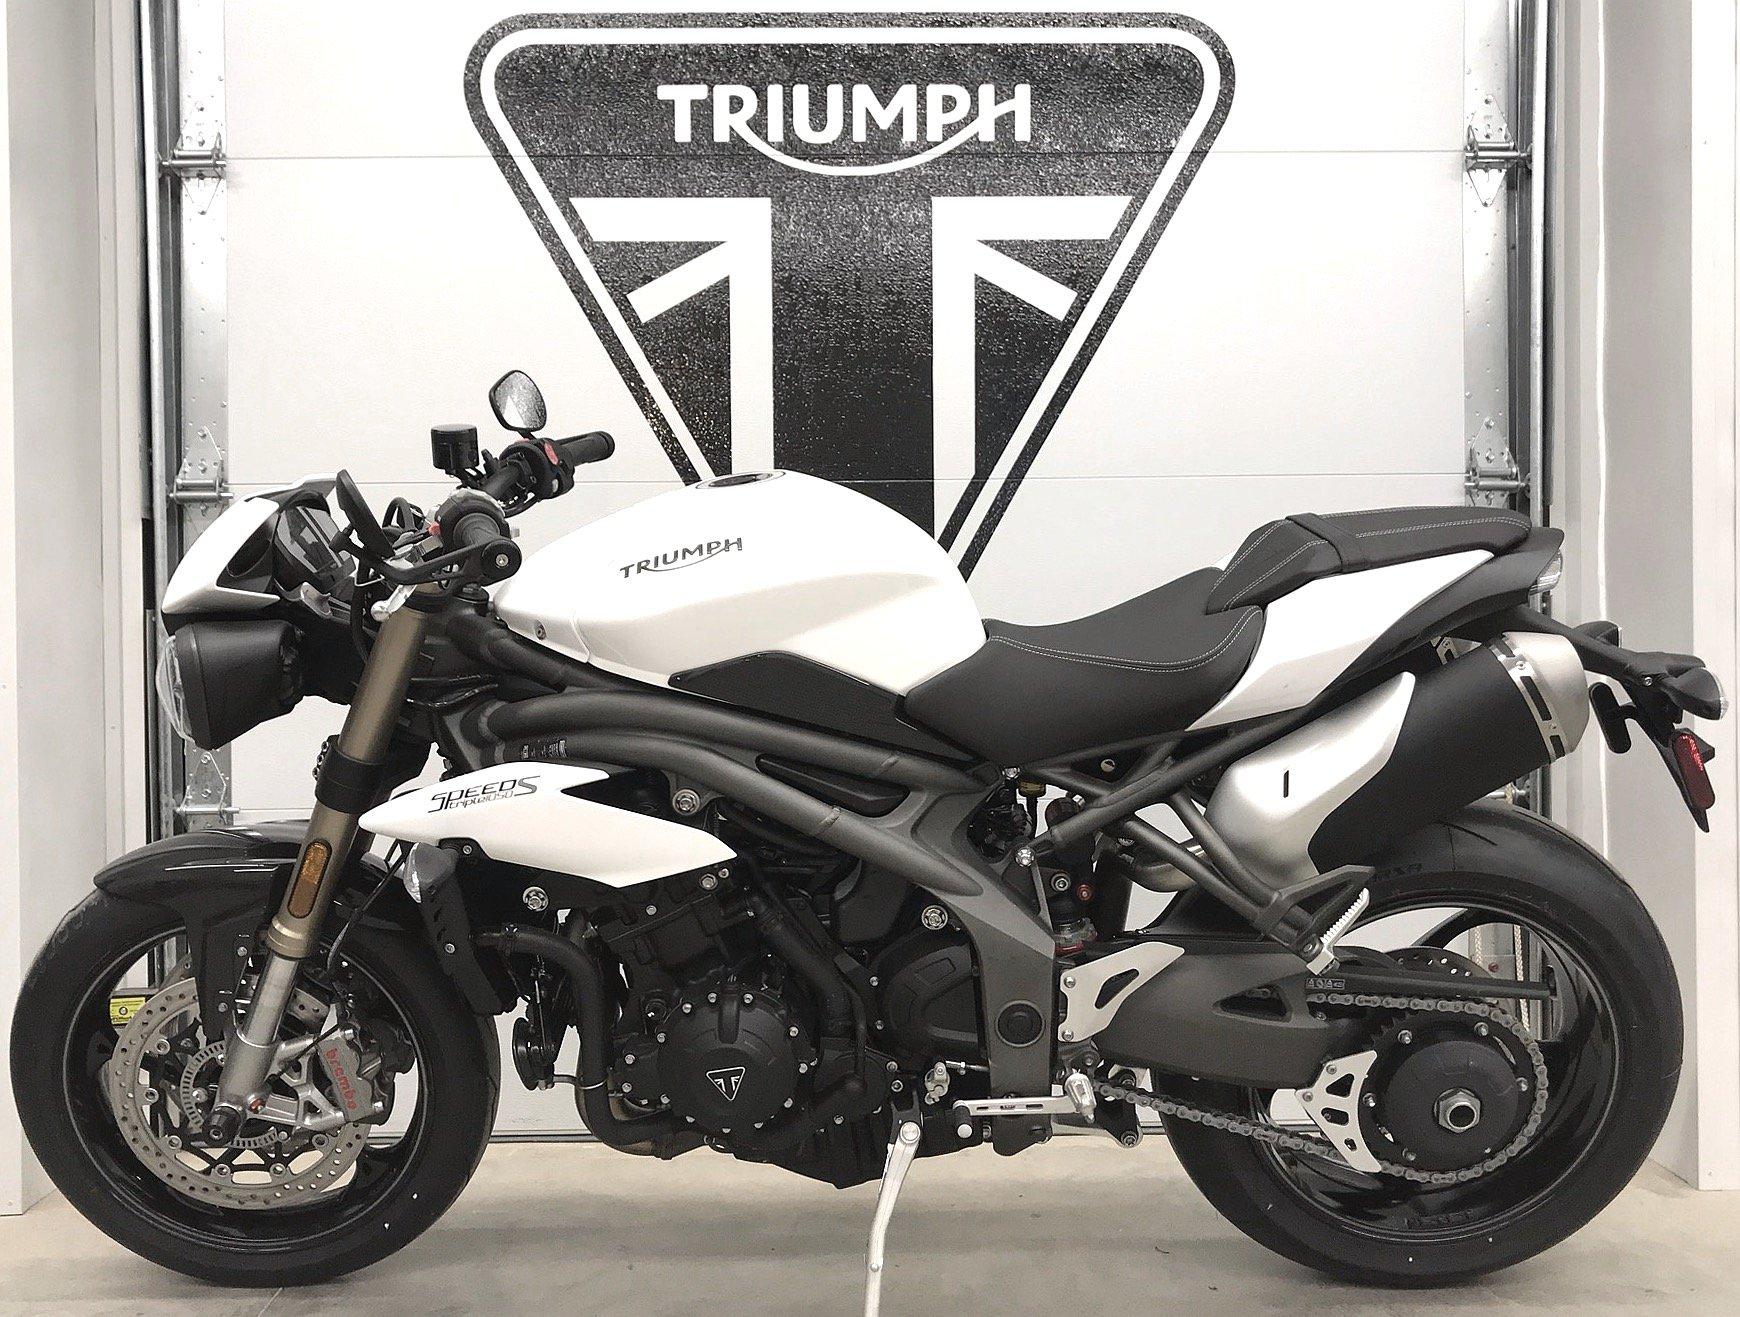 2019 Triumph Speed Triple S Baxter Cycle